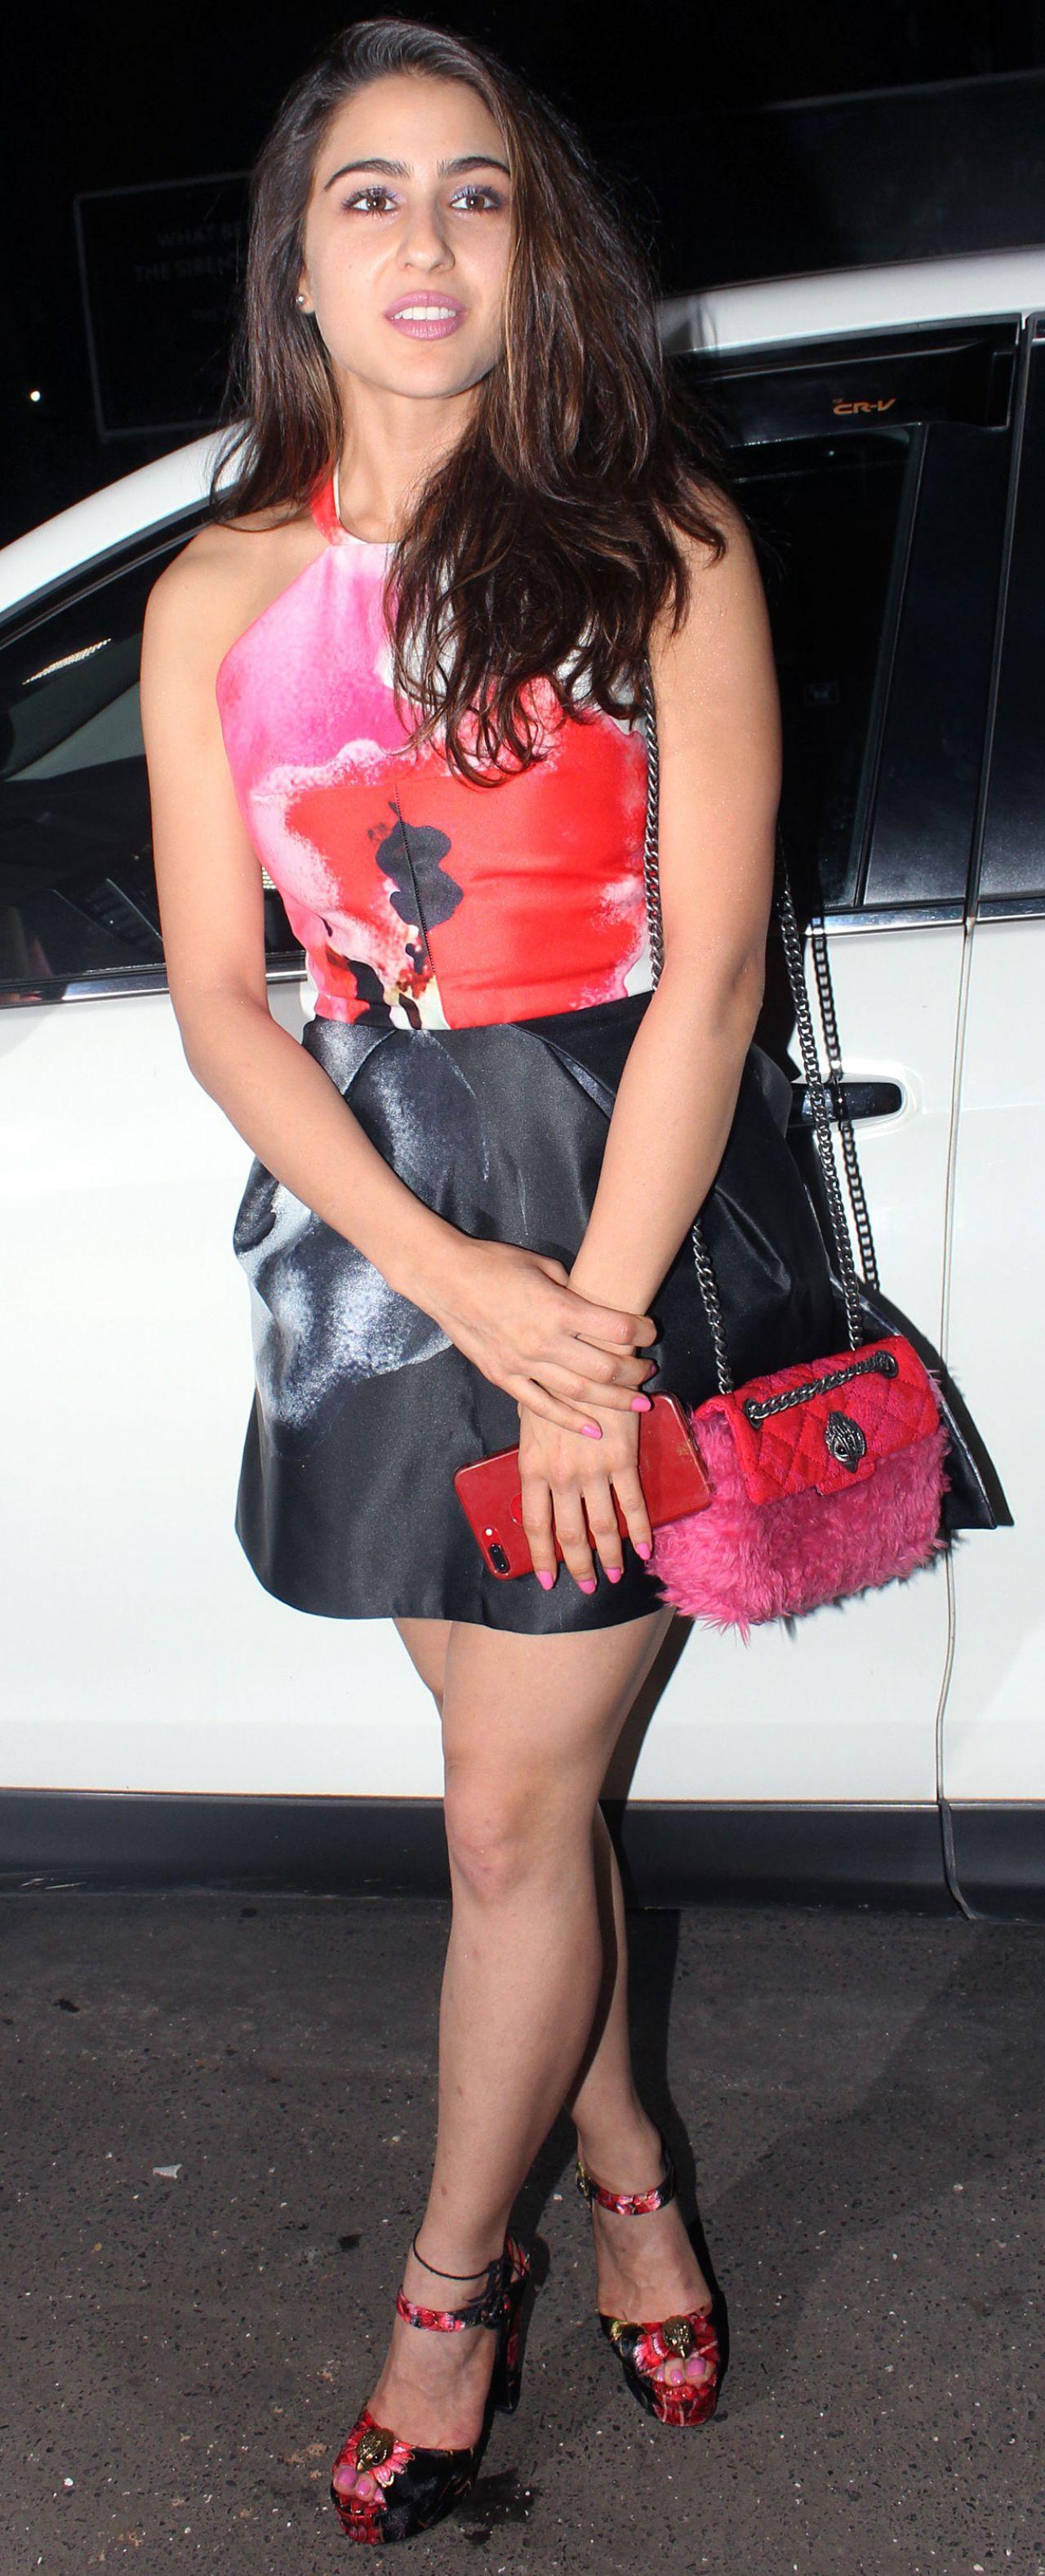 Celebrity Hair Dressers/Salons - Mumbai Forum - TripAdvisor